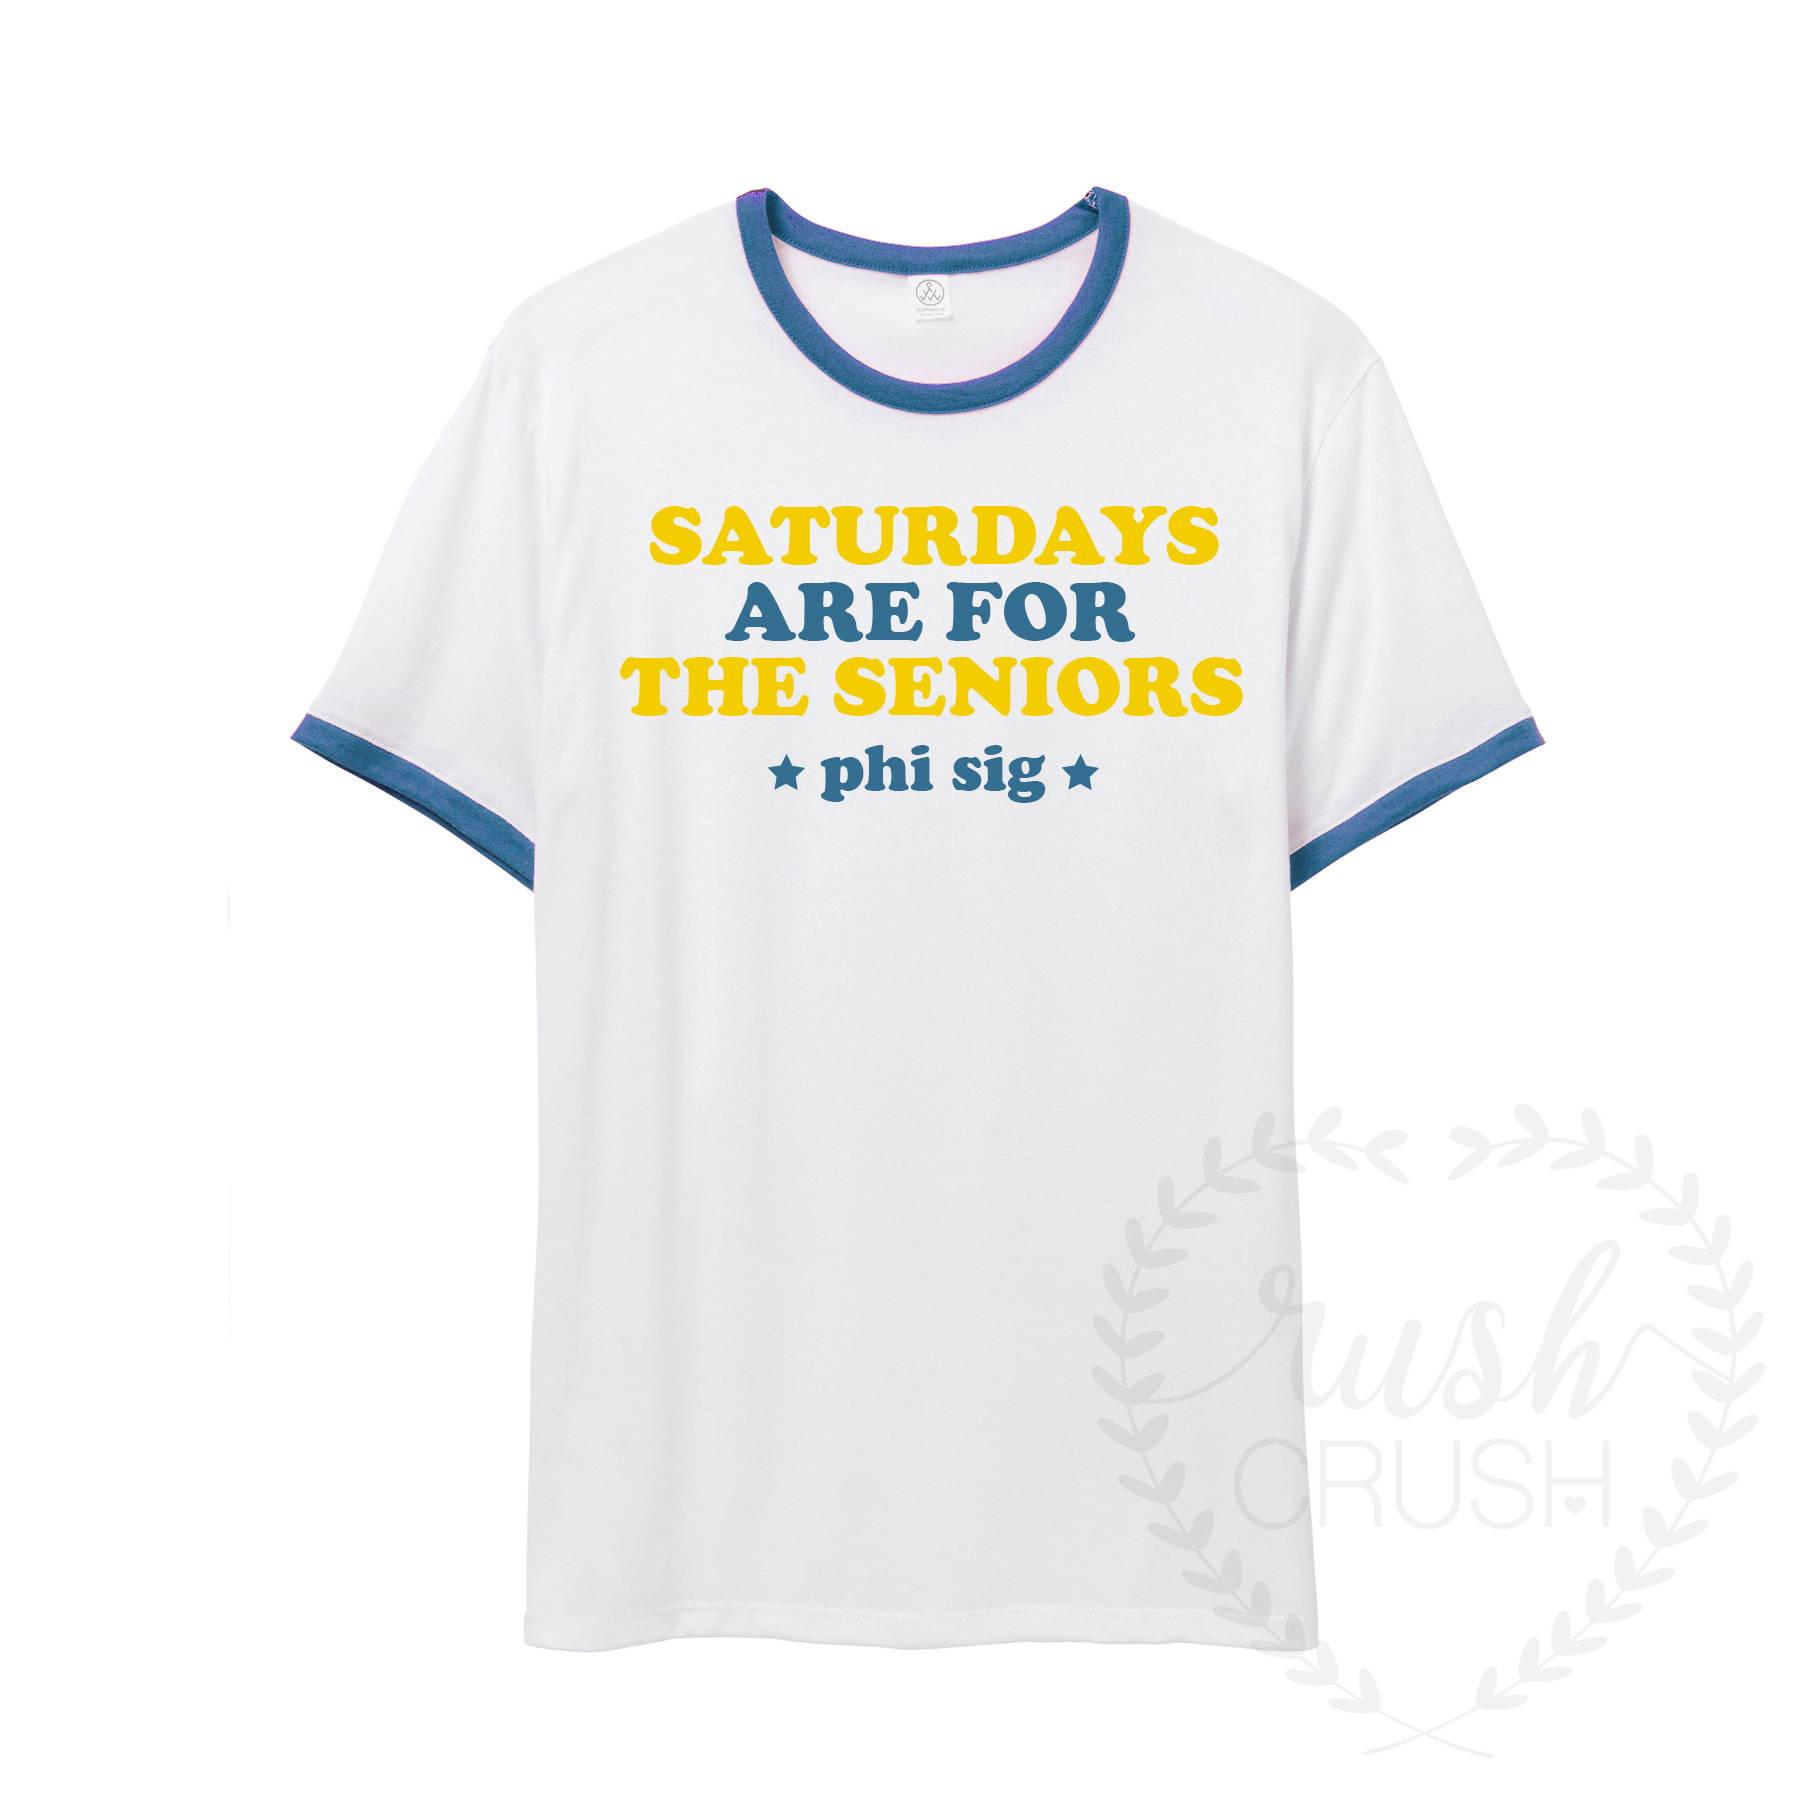 Saturdays are for Seniors Shirt